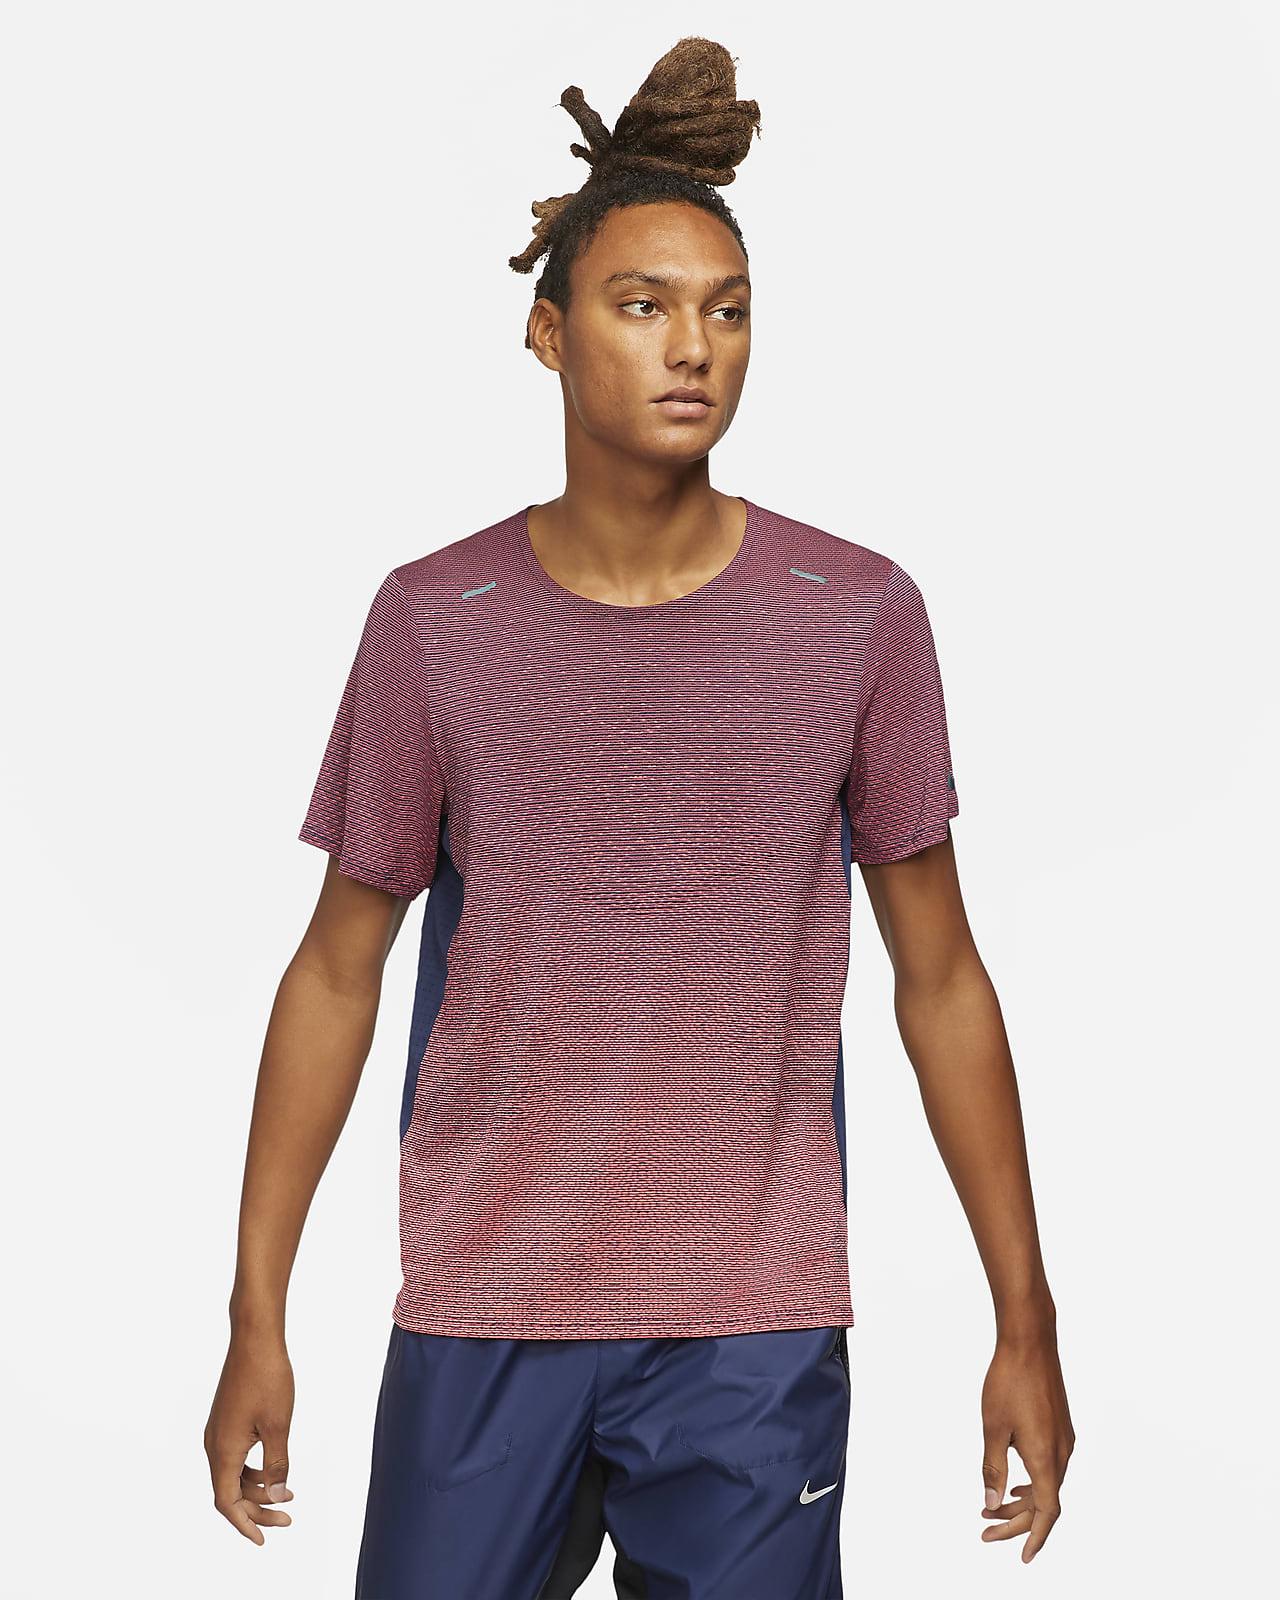 Maglia da running a manica corta Nike Pinnacle Run Division - Uomo